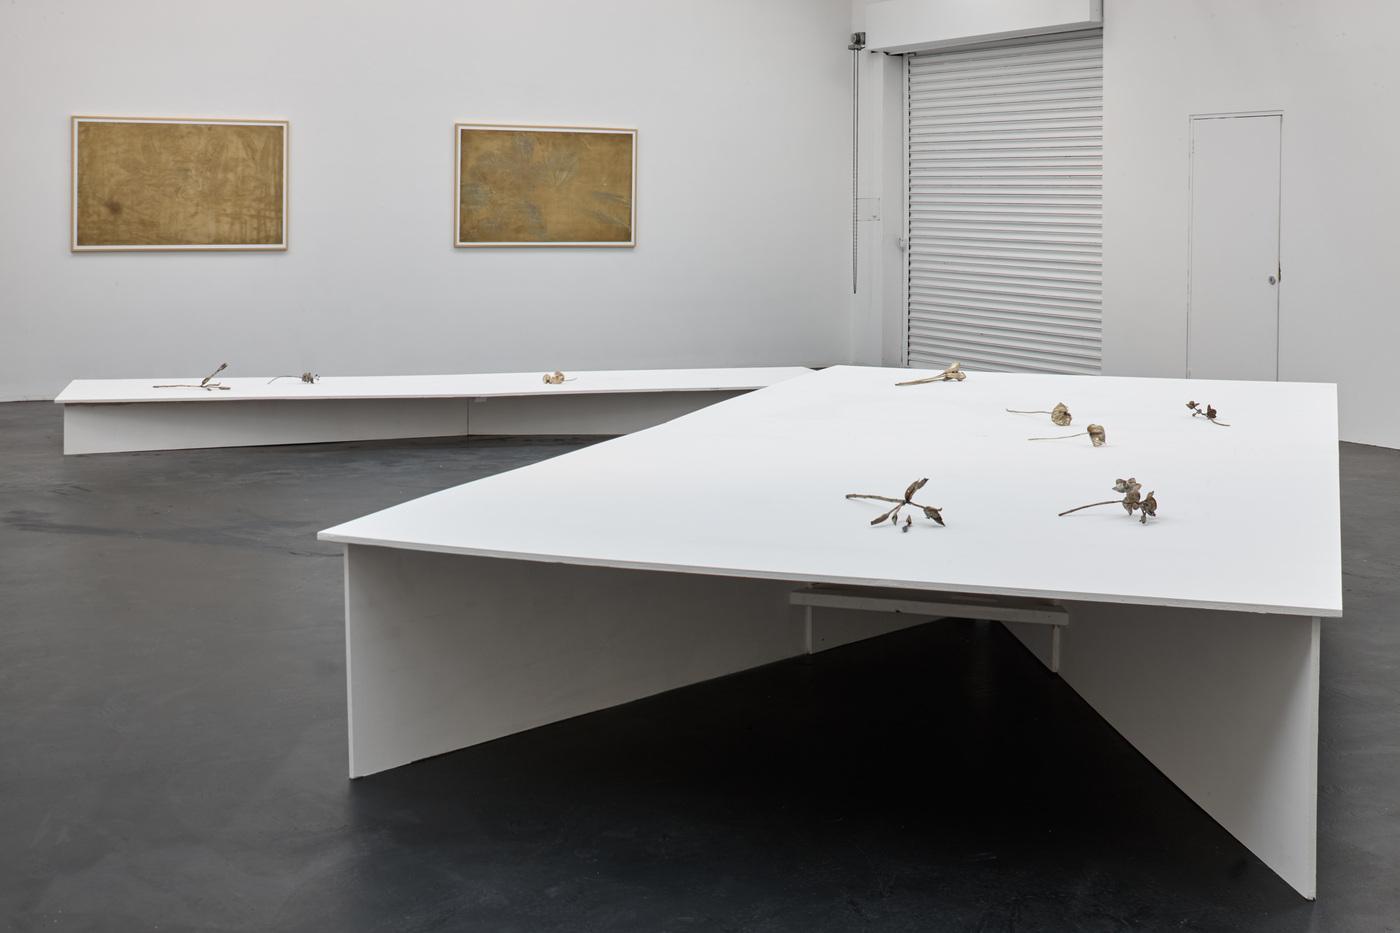 Ross Iannatti - Oro Valley - Installation View I